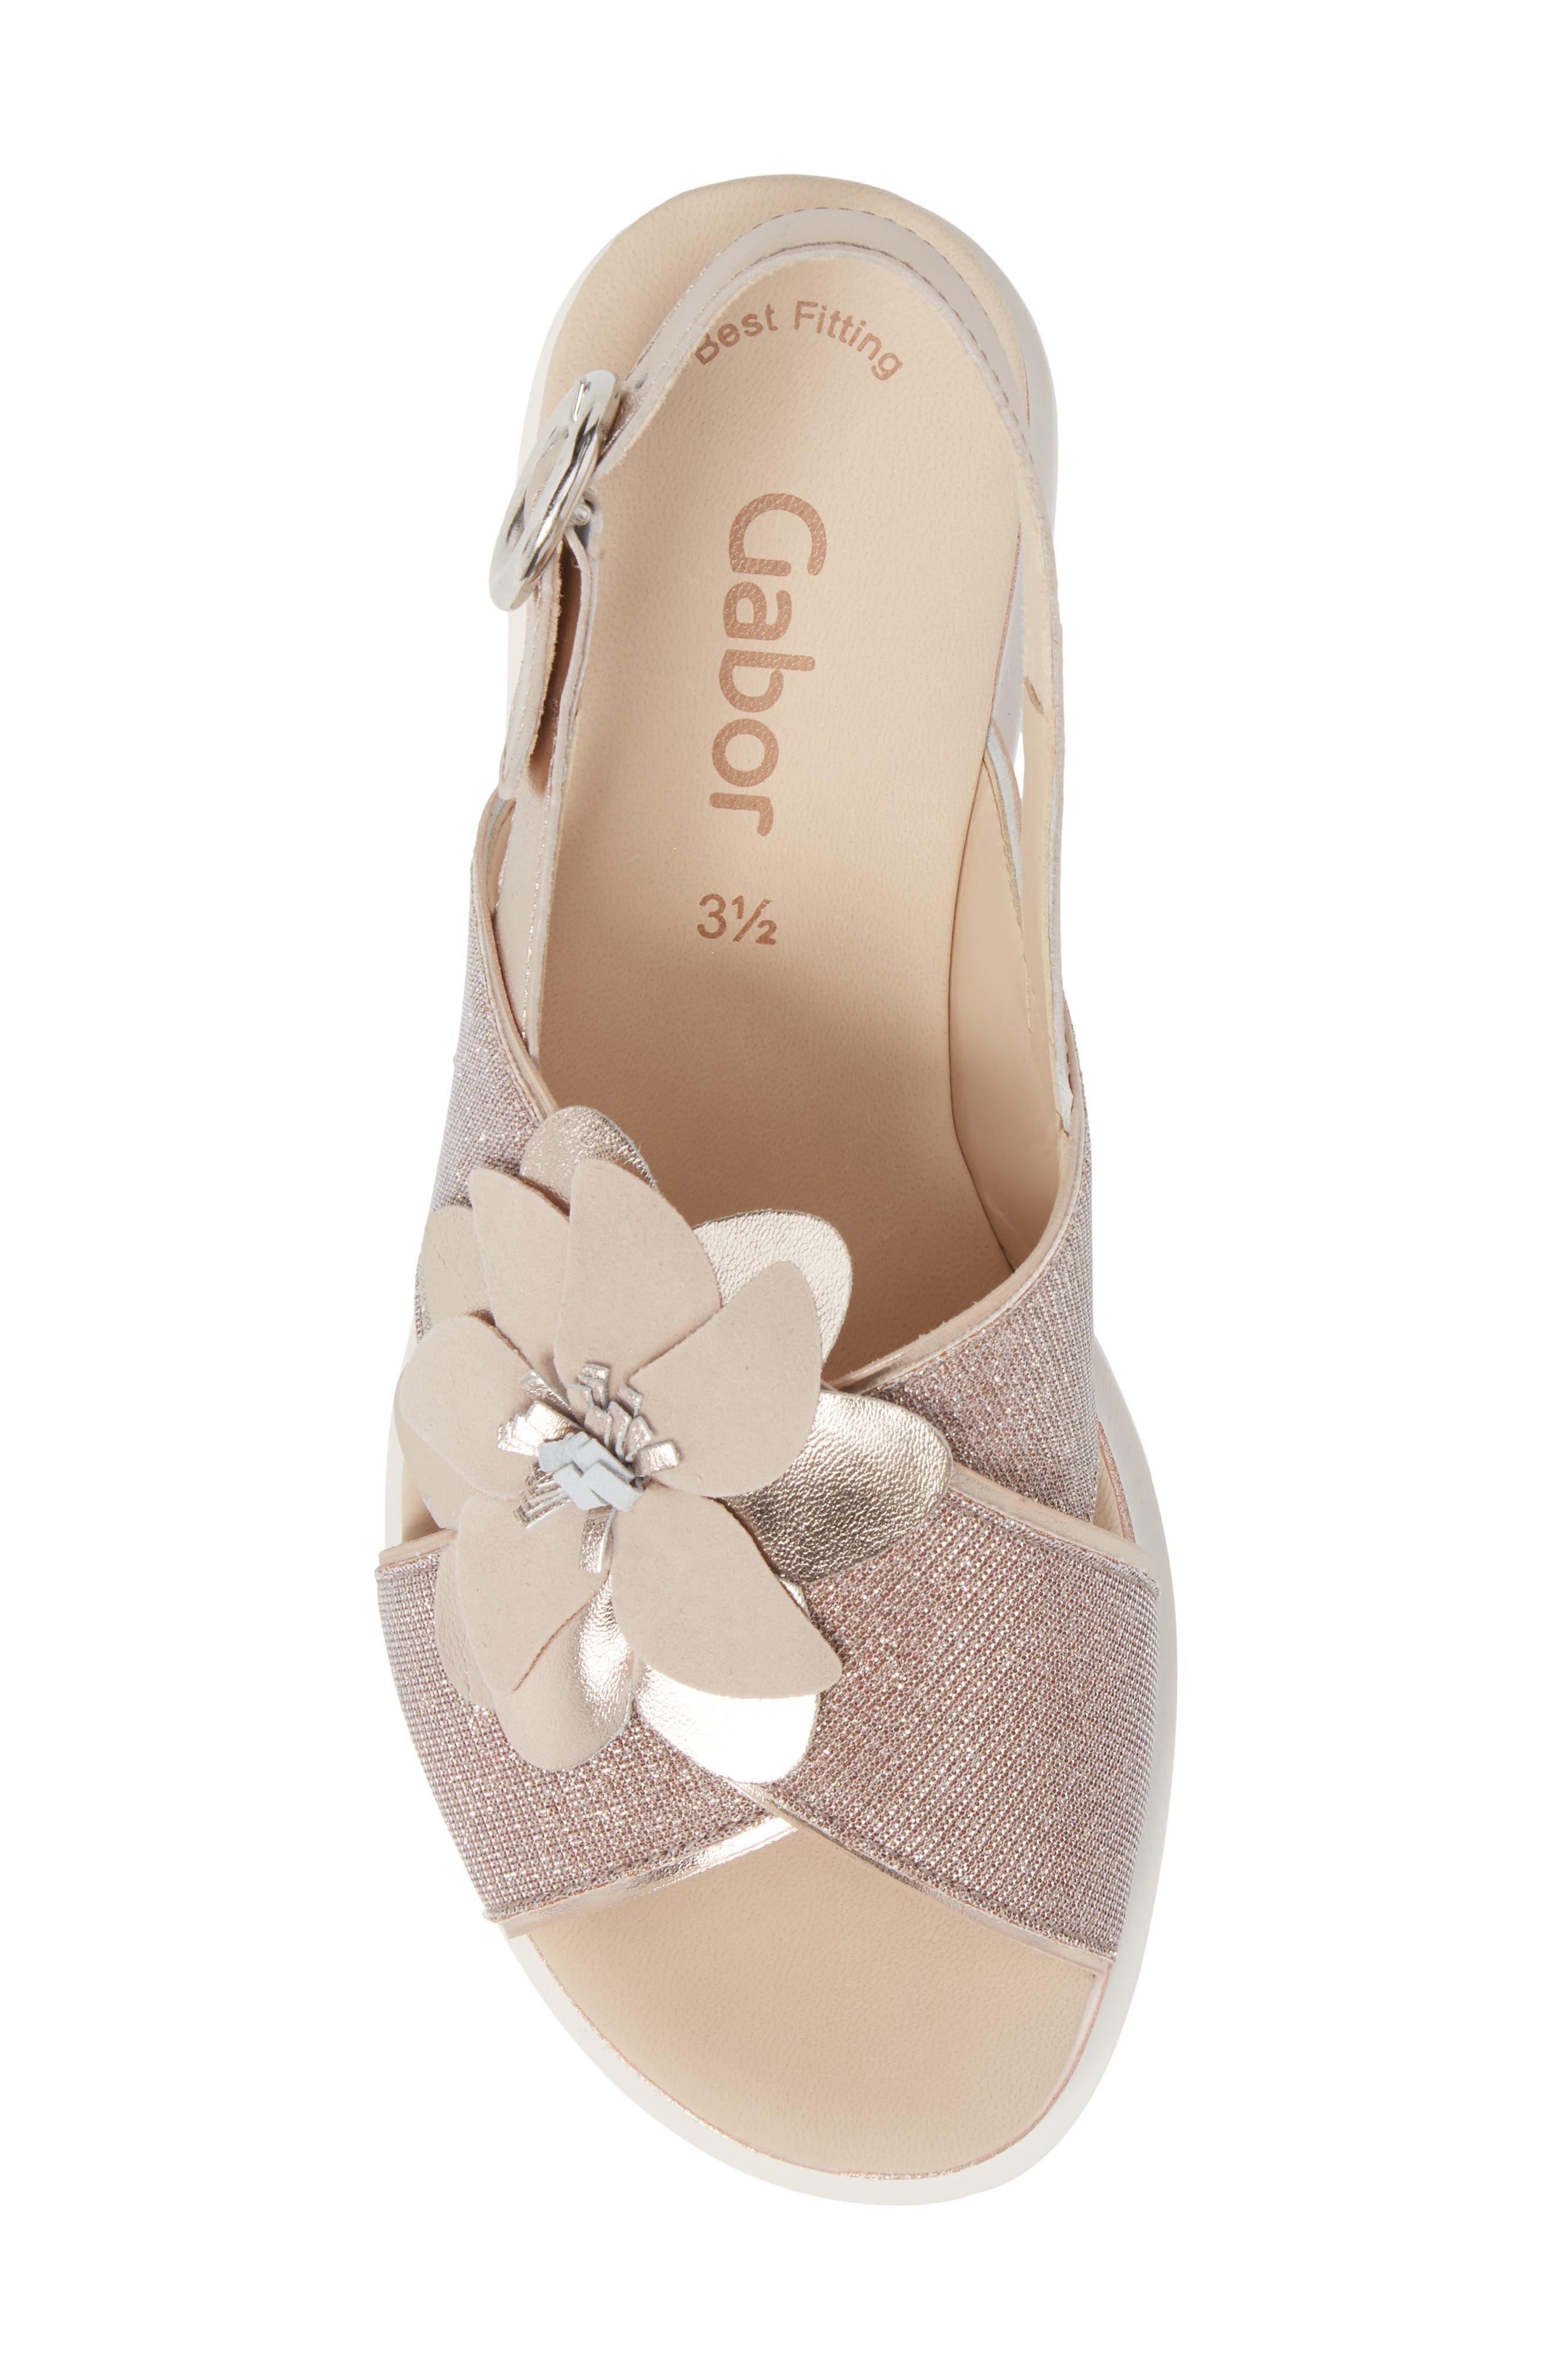 Flower Platform Sandal,                             Alternate thumbnail 5, color,                             Rose Metallic Fabric